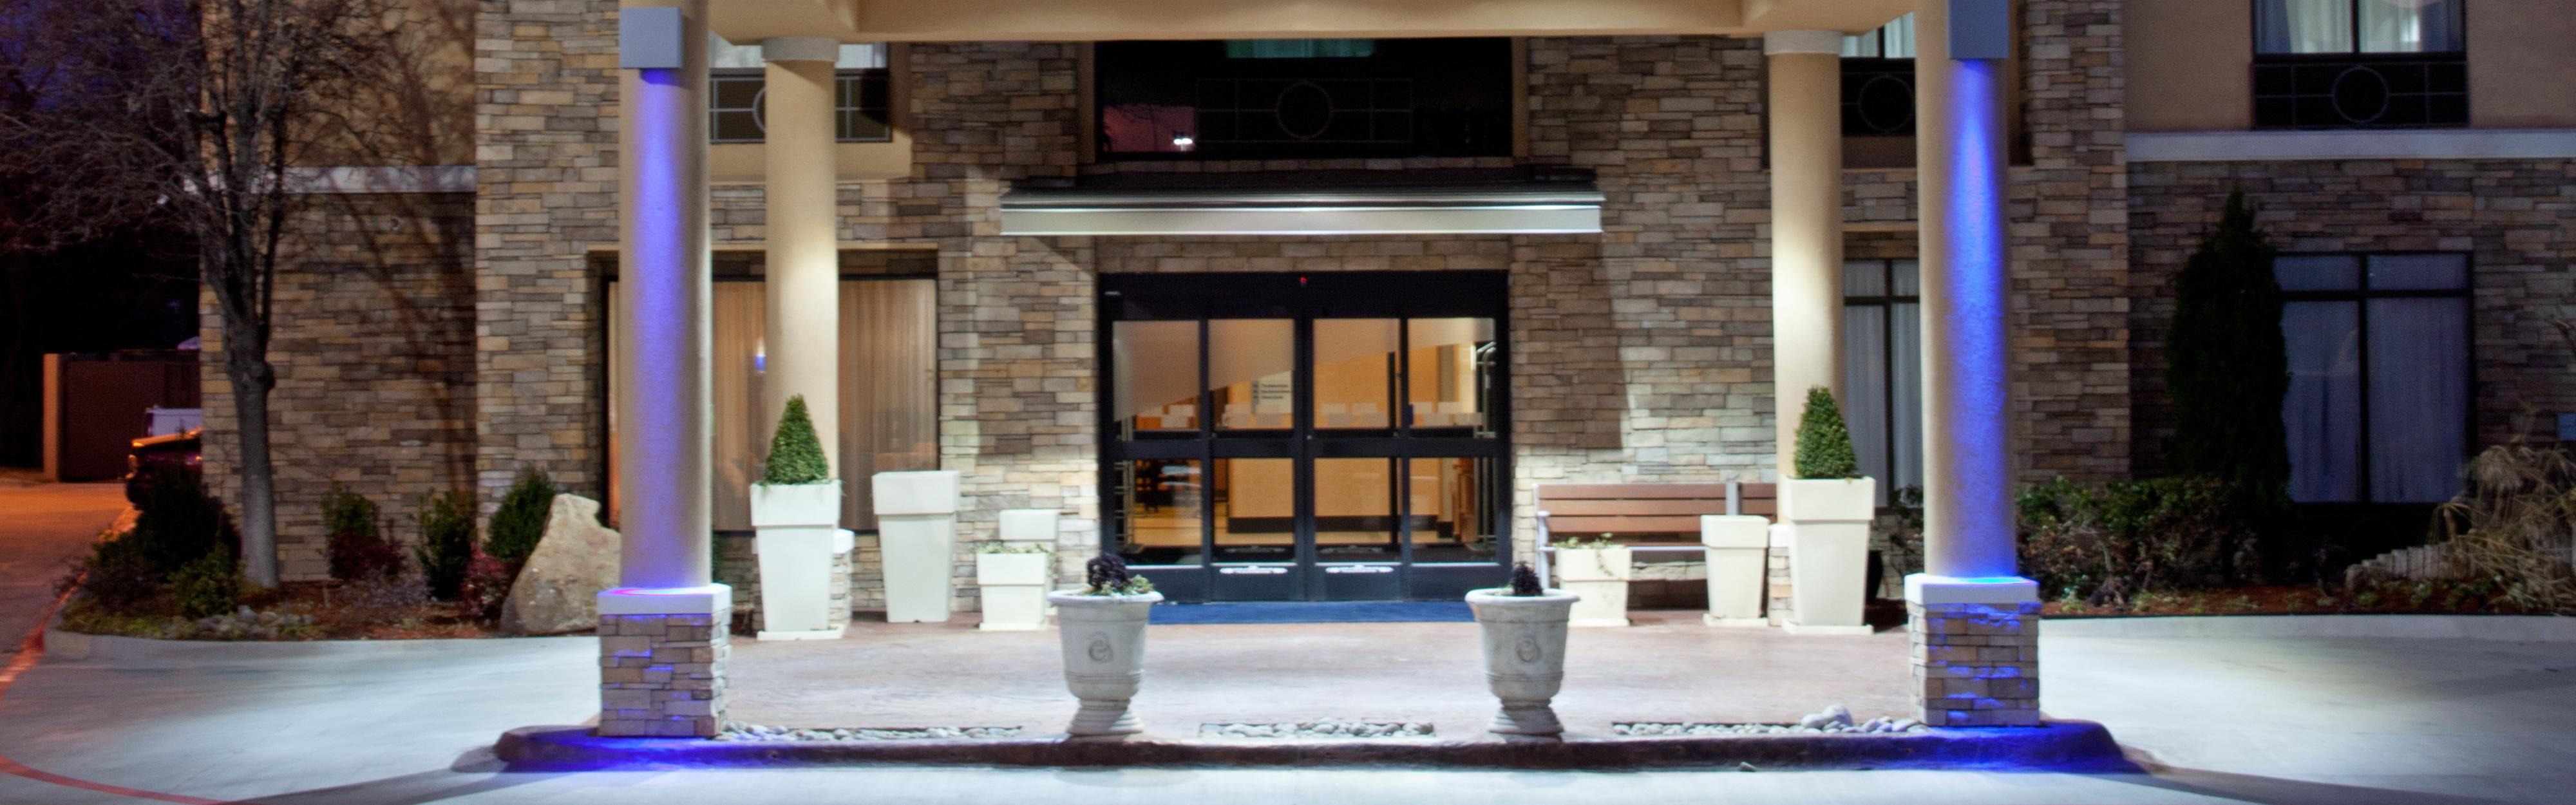 Holiday Inn Express & Suites Arlington (I-20-Parks Mall) image 0